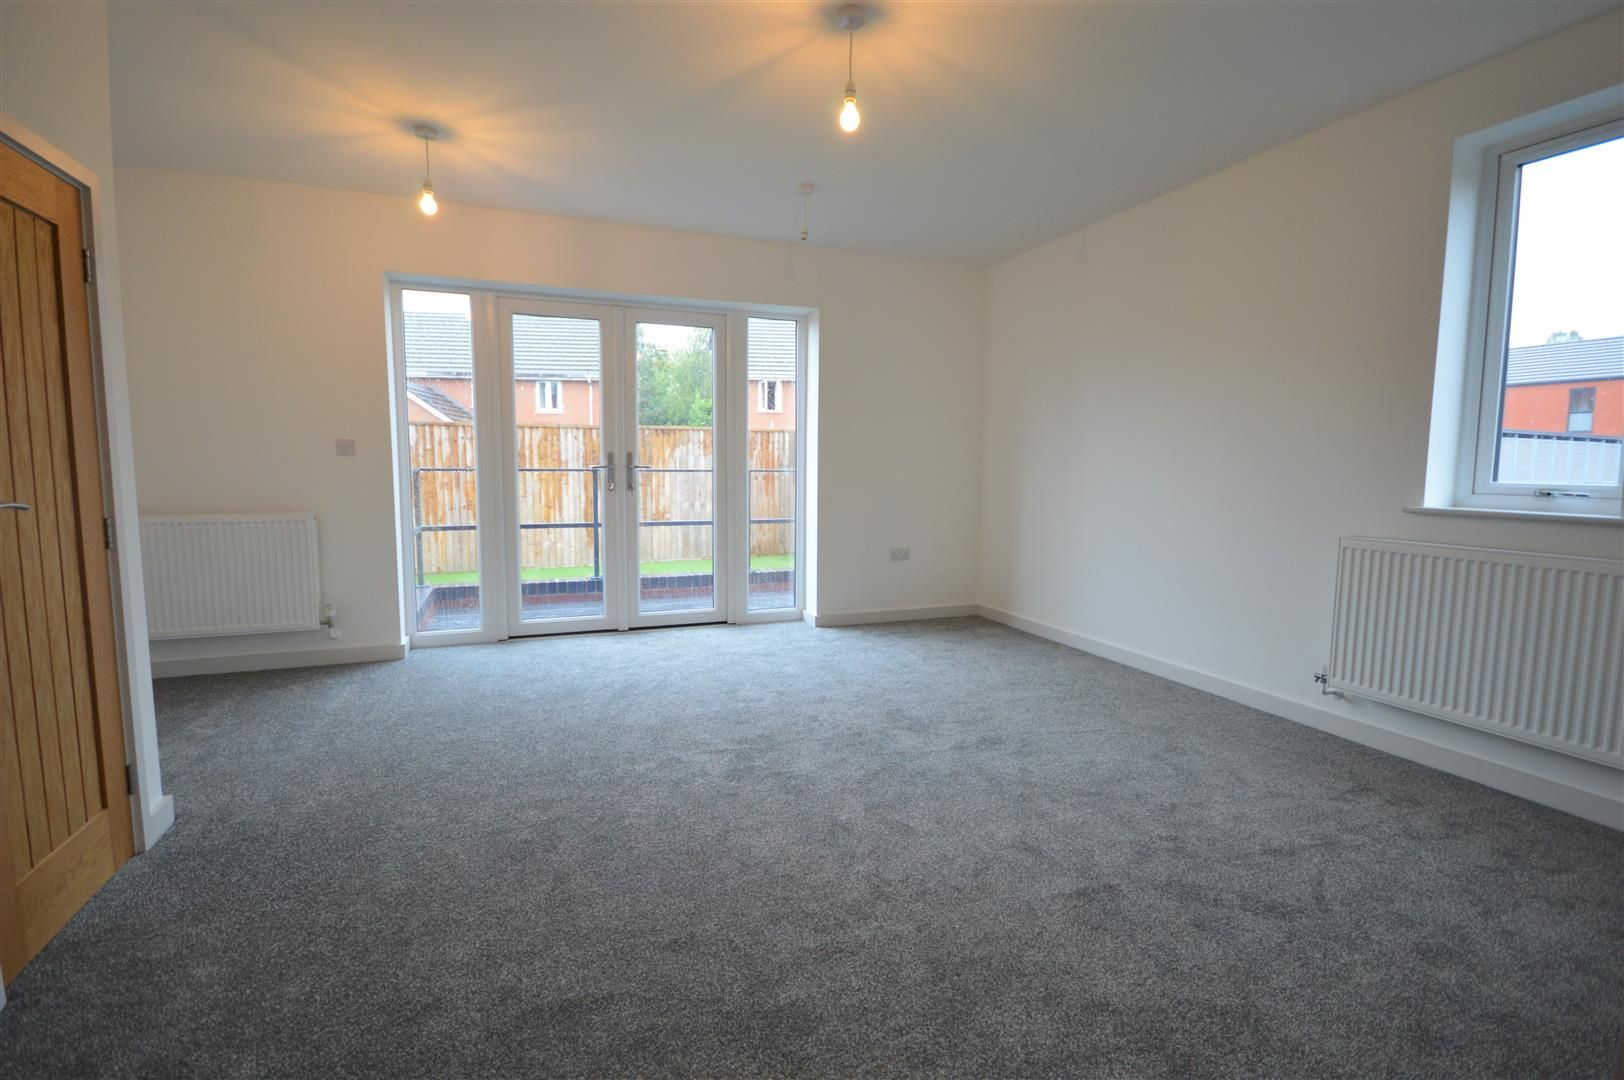 2 bed detached for sale in Leominster  - Property Image 4